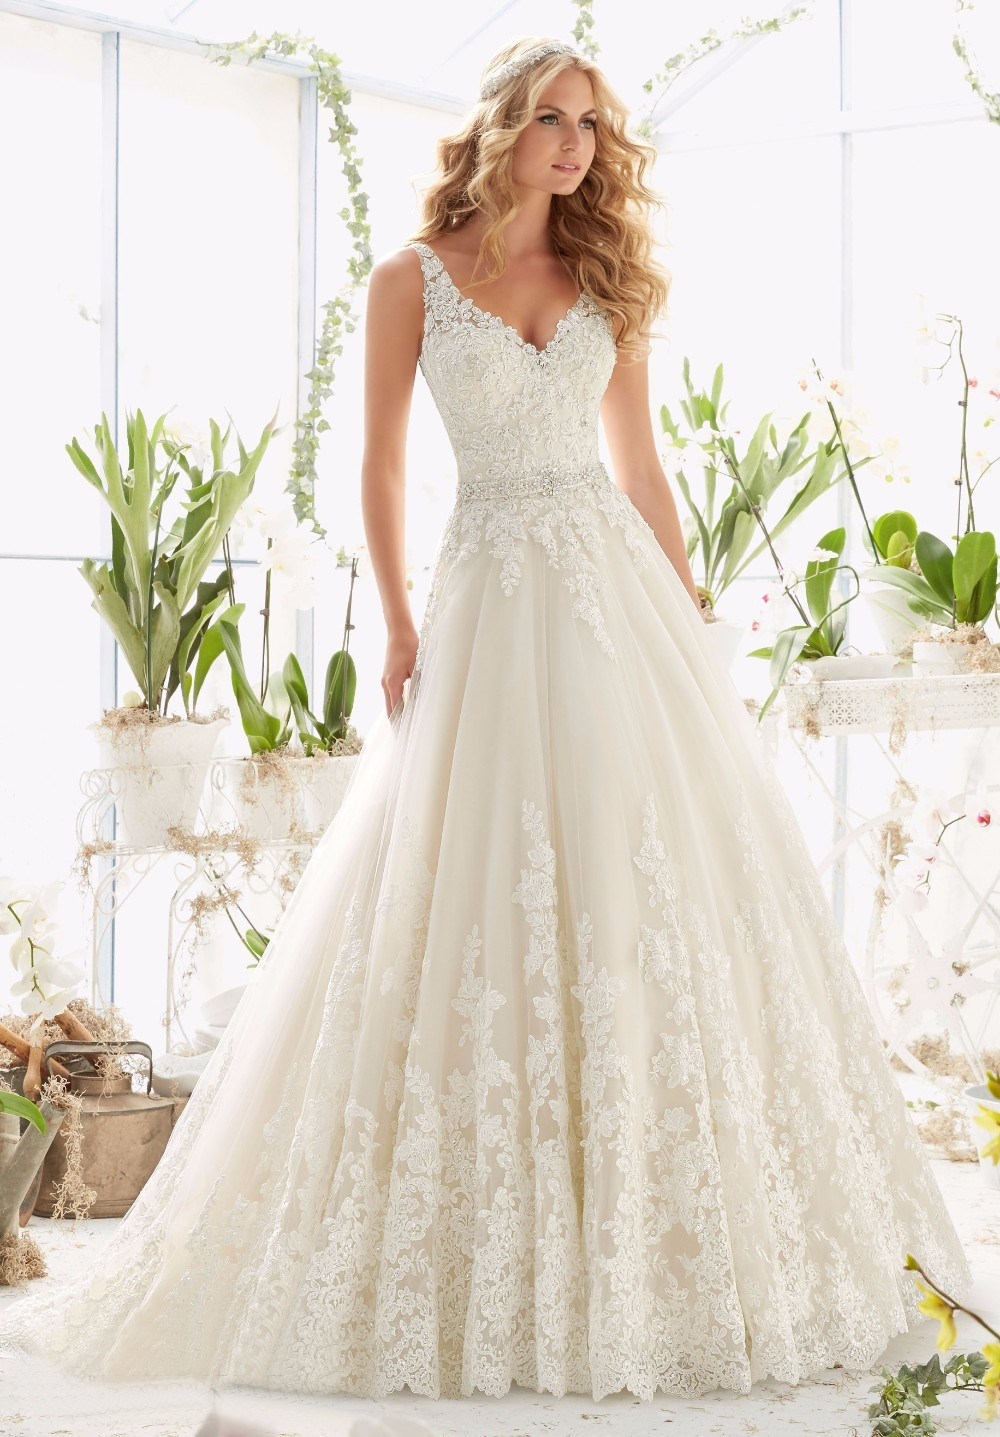 Vivian's Bridal 2018 Fashion Deep V Neck A-line Wedding Dress Sleeveless Backless Lace Applique Sashes Floor-length Bridal Dress